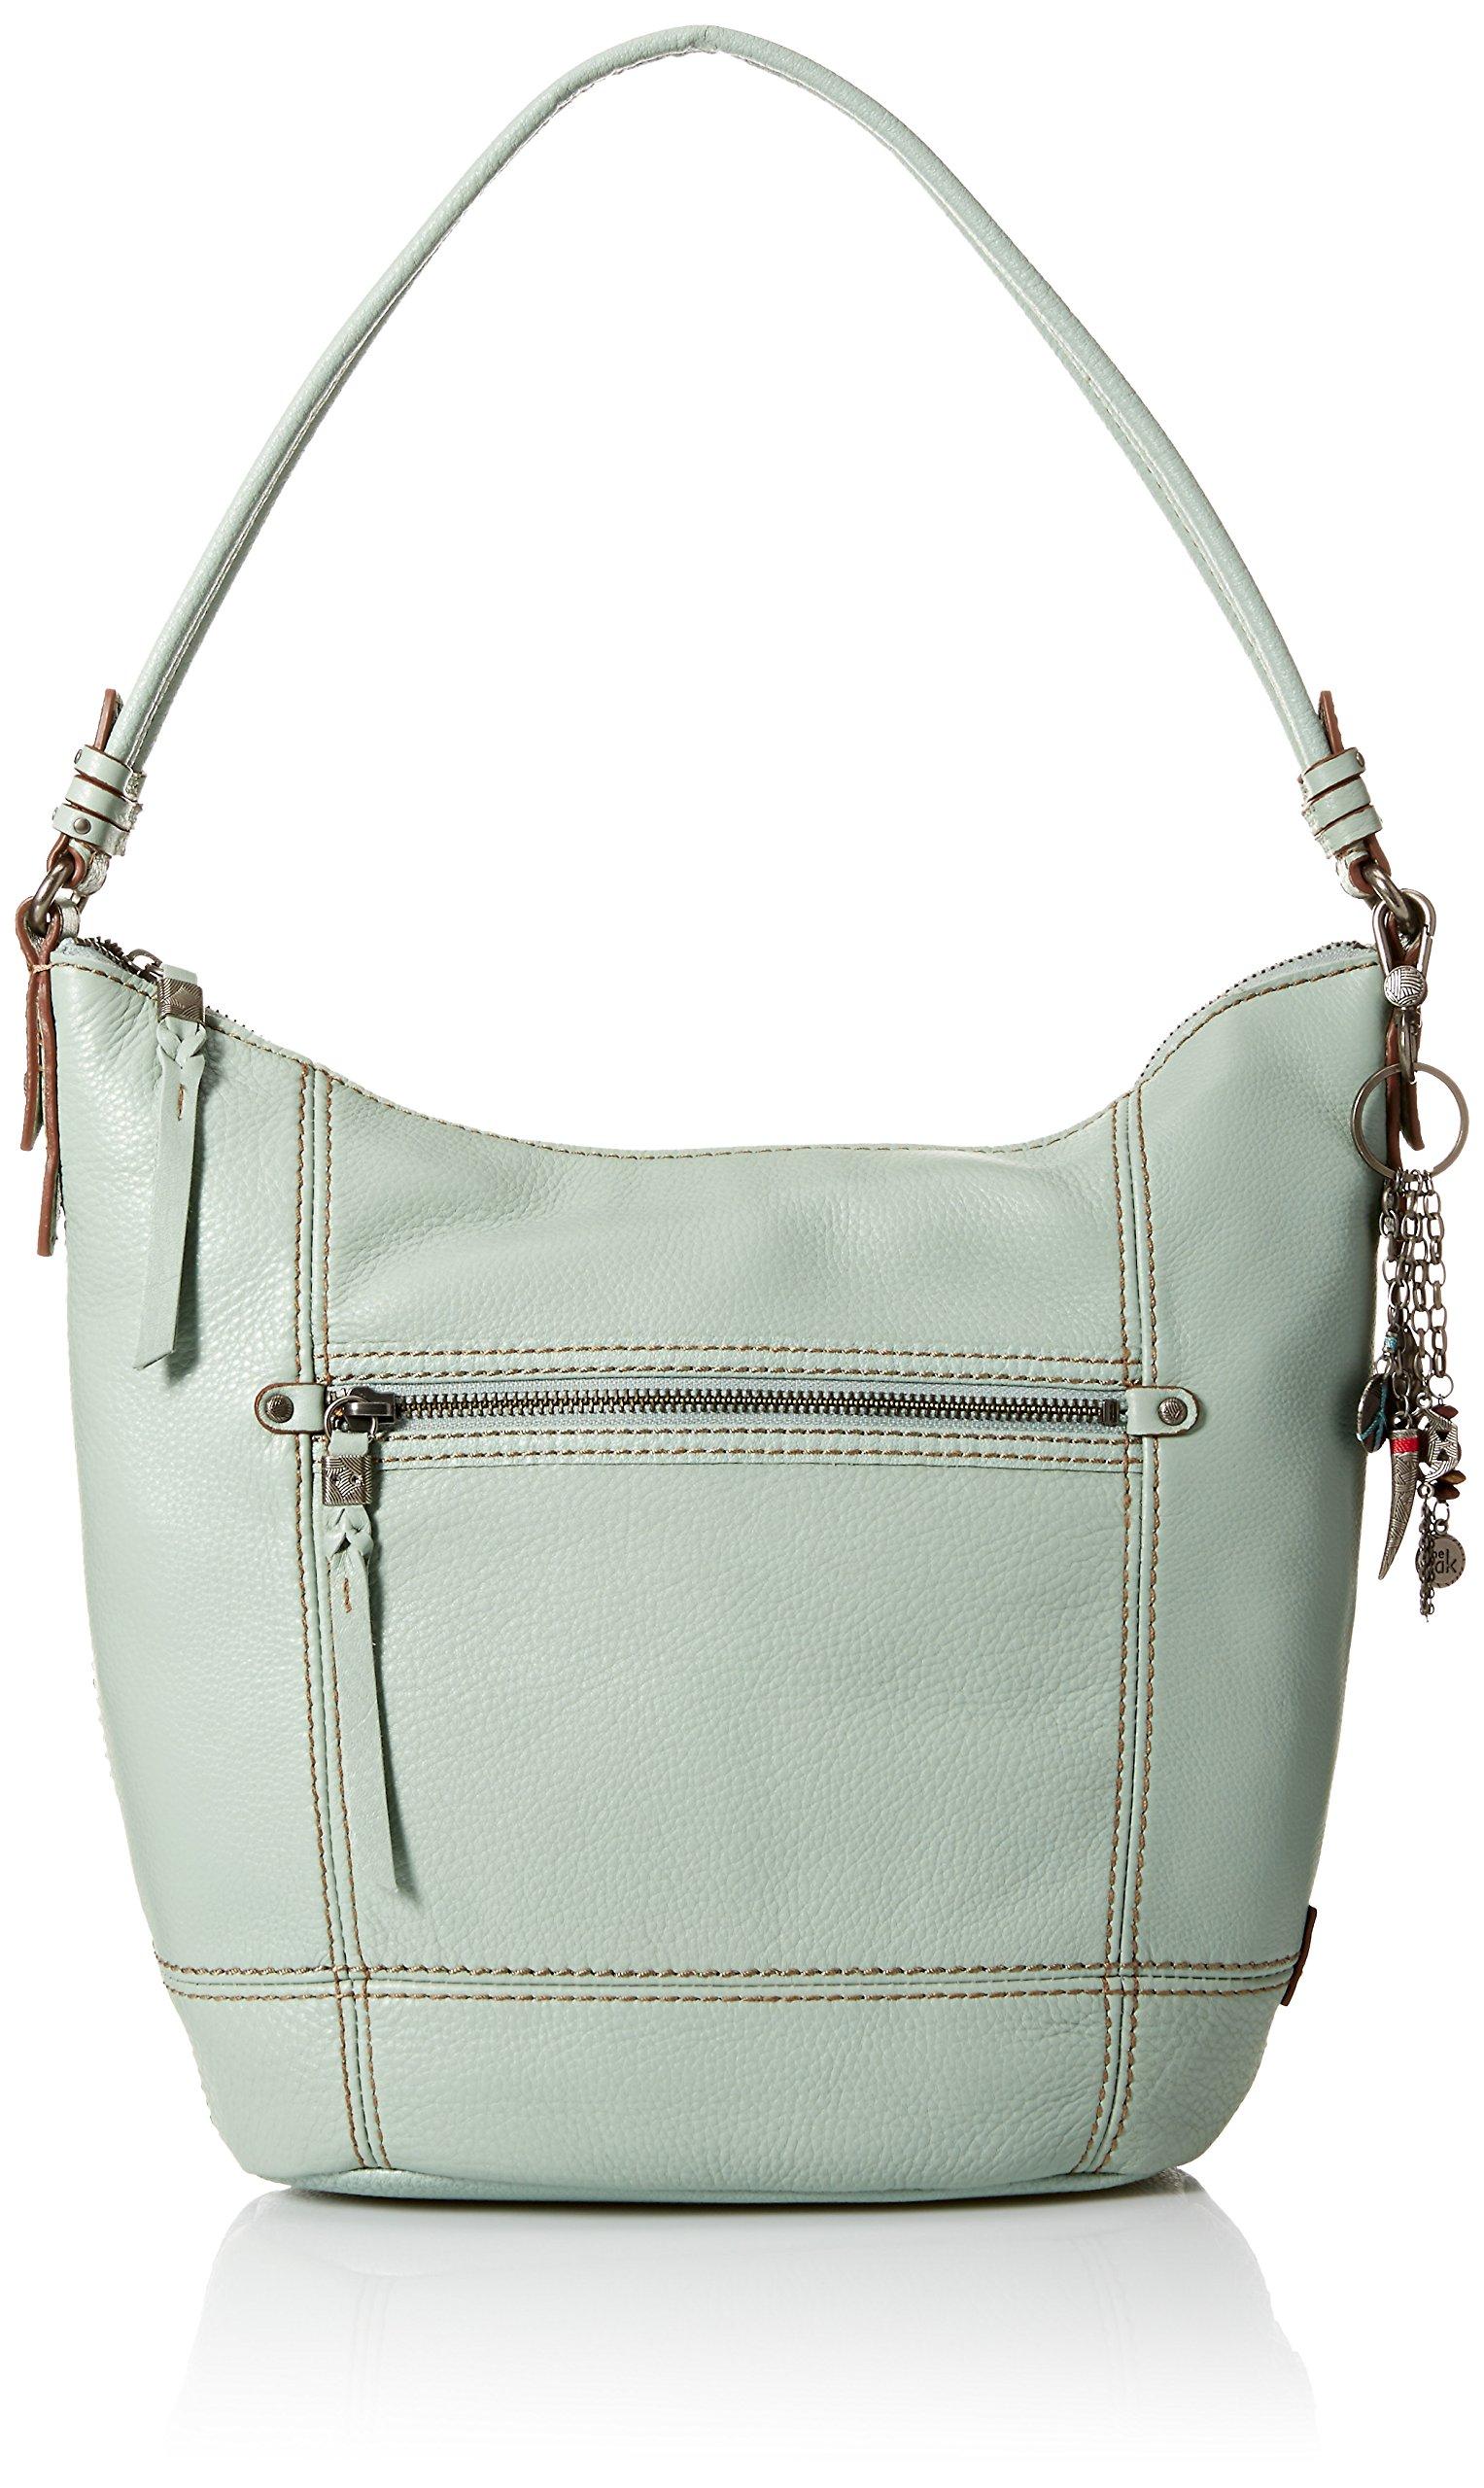 The Sak Sequoia Hobo Bag, Mint Leather